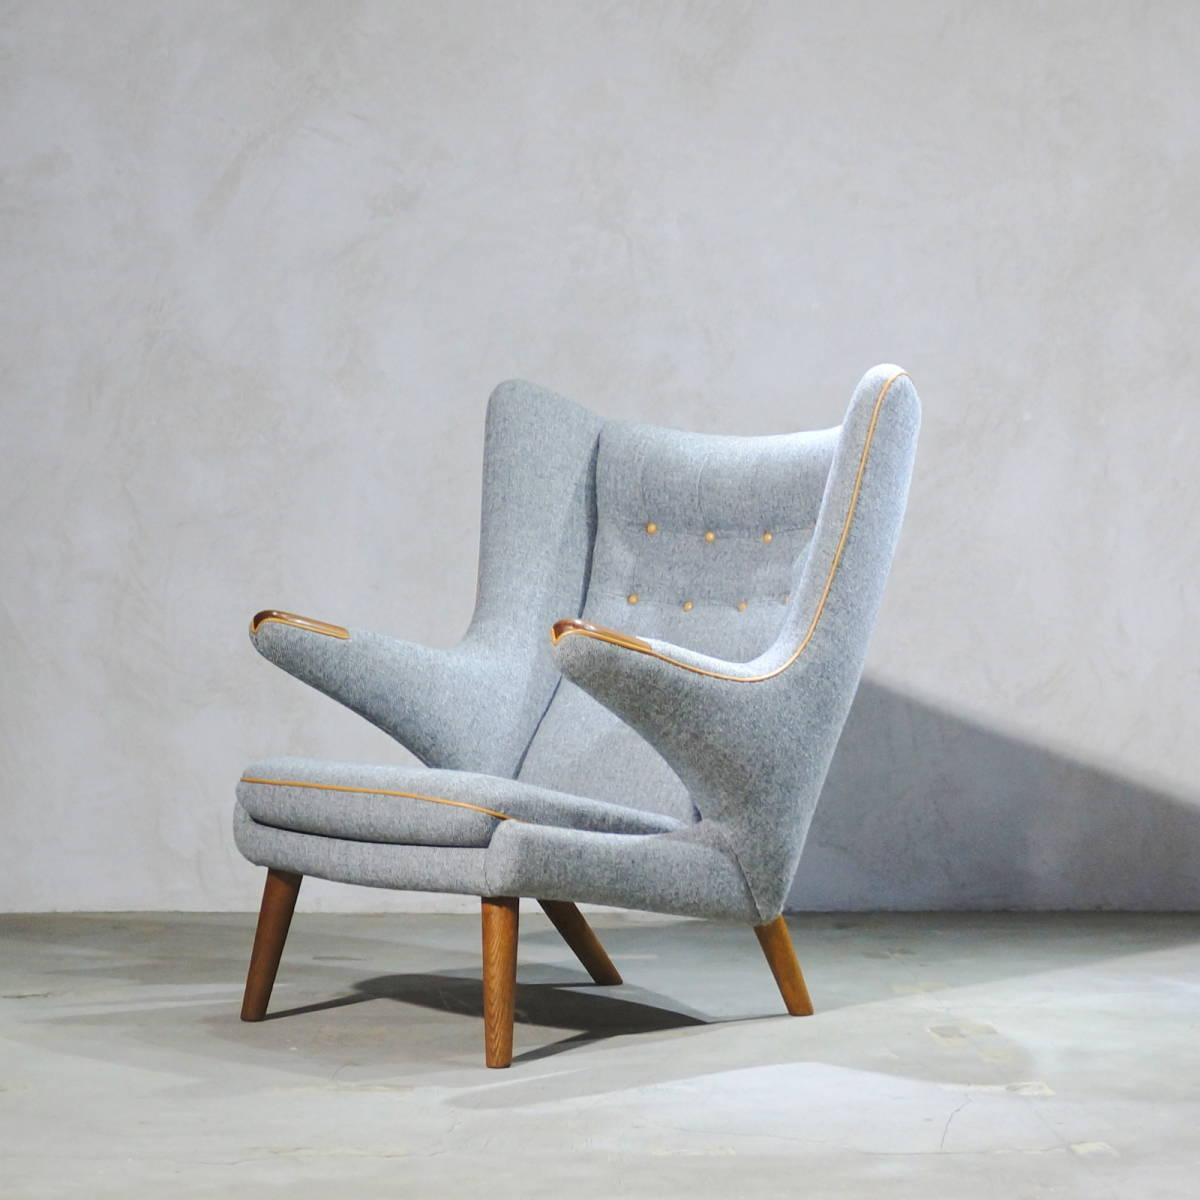 Hans J. Wegner ウェグナー AP-19 Bear Chair ベアチェア Teak & Oak チークオーク ※フィンユール モーエンセン_画像2